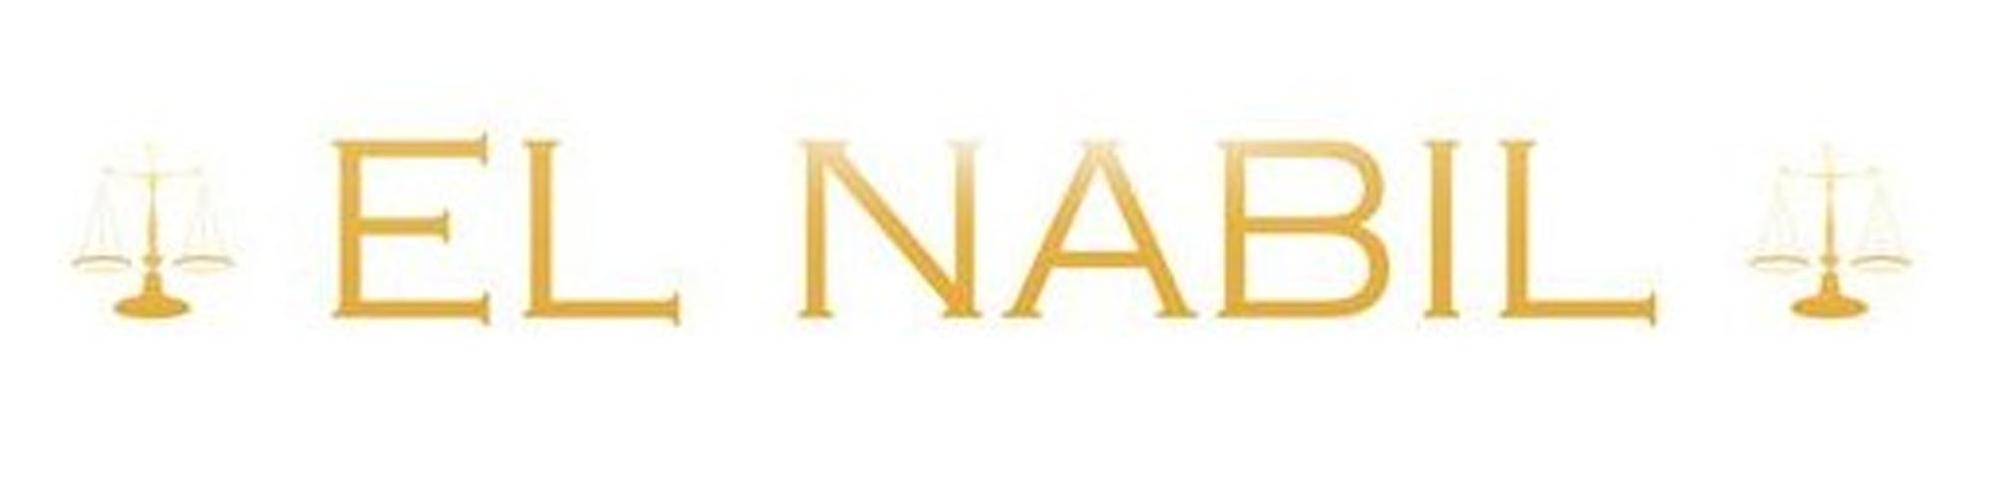 El Nabil Luxery Perfumes